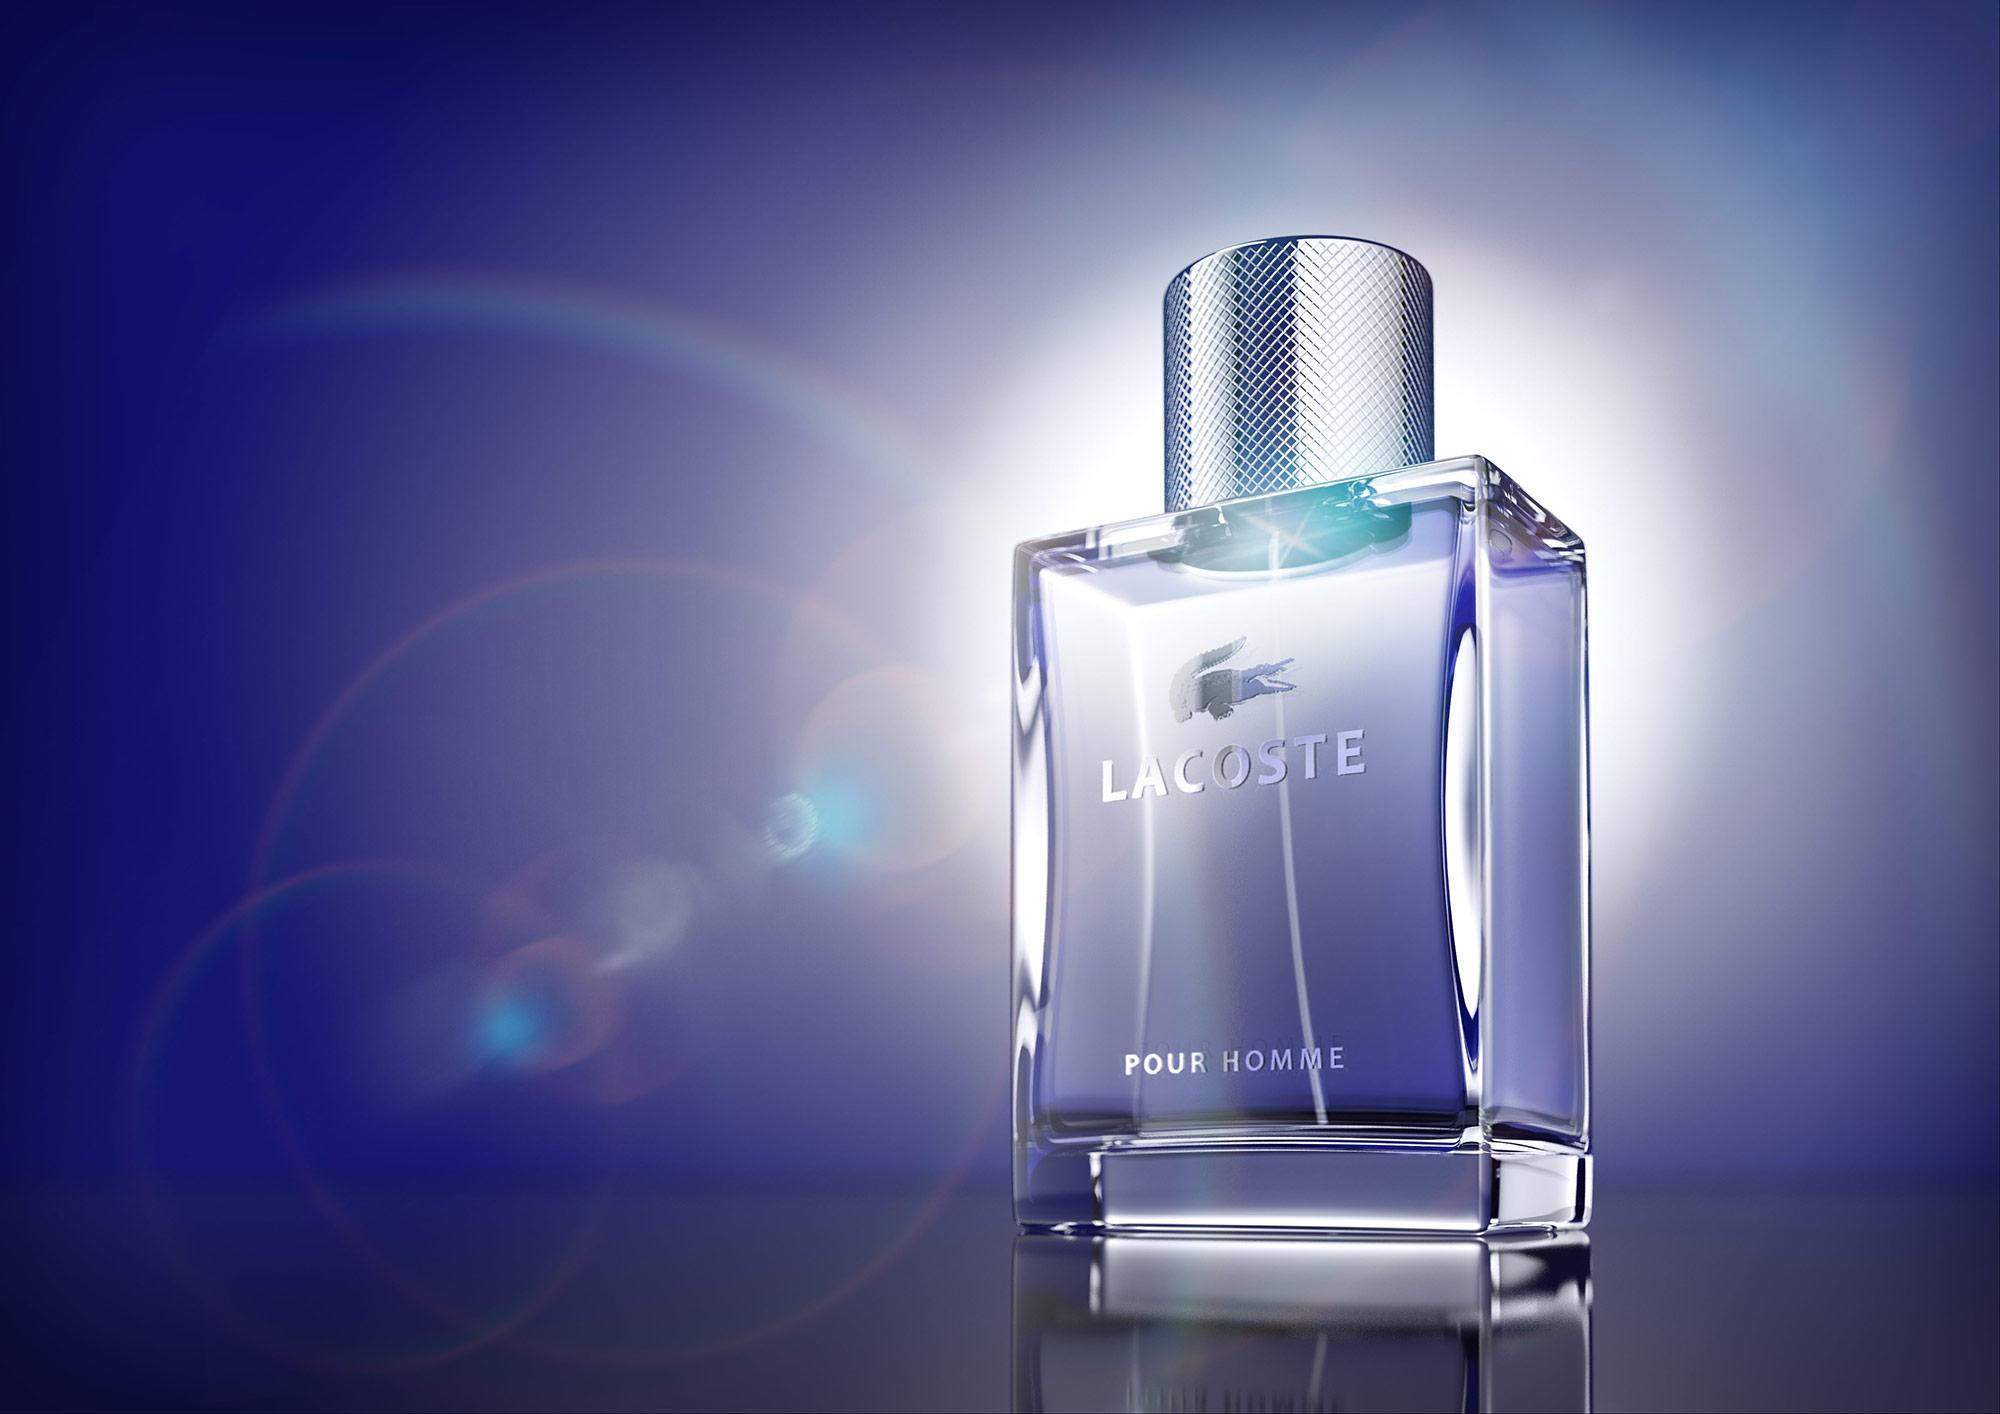 CGI Rendering 3d Lacoste Pour Homme Perfume Perfum Fragrance Kosmetik Cosmetics Pharma Idris Kolodziej